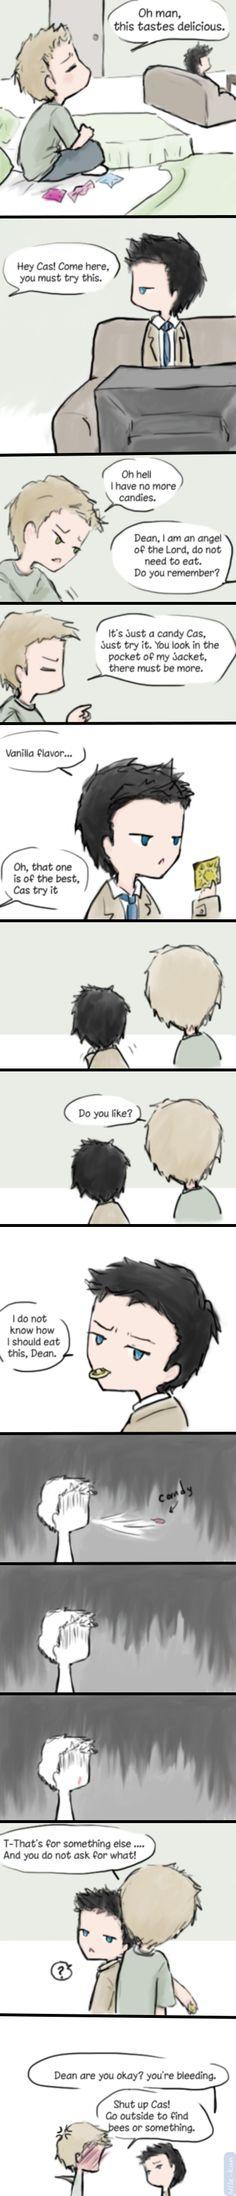 Candies by ~Nile-kun on deviantART LOL